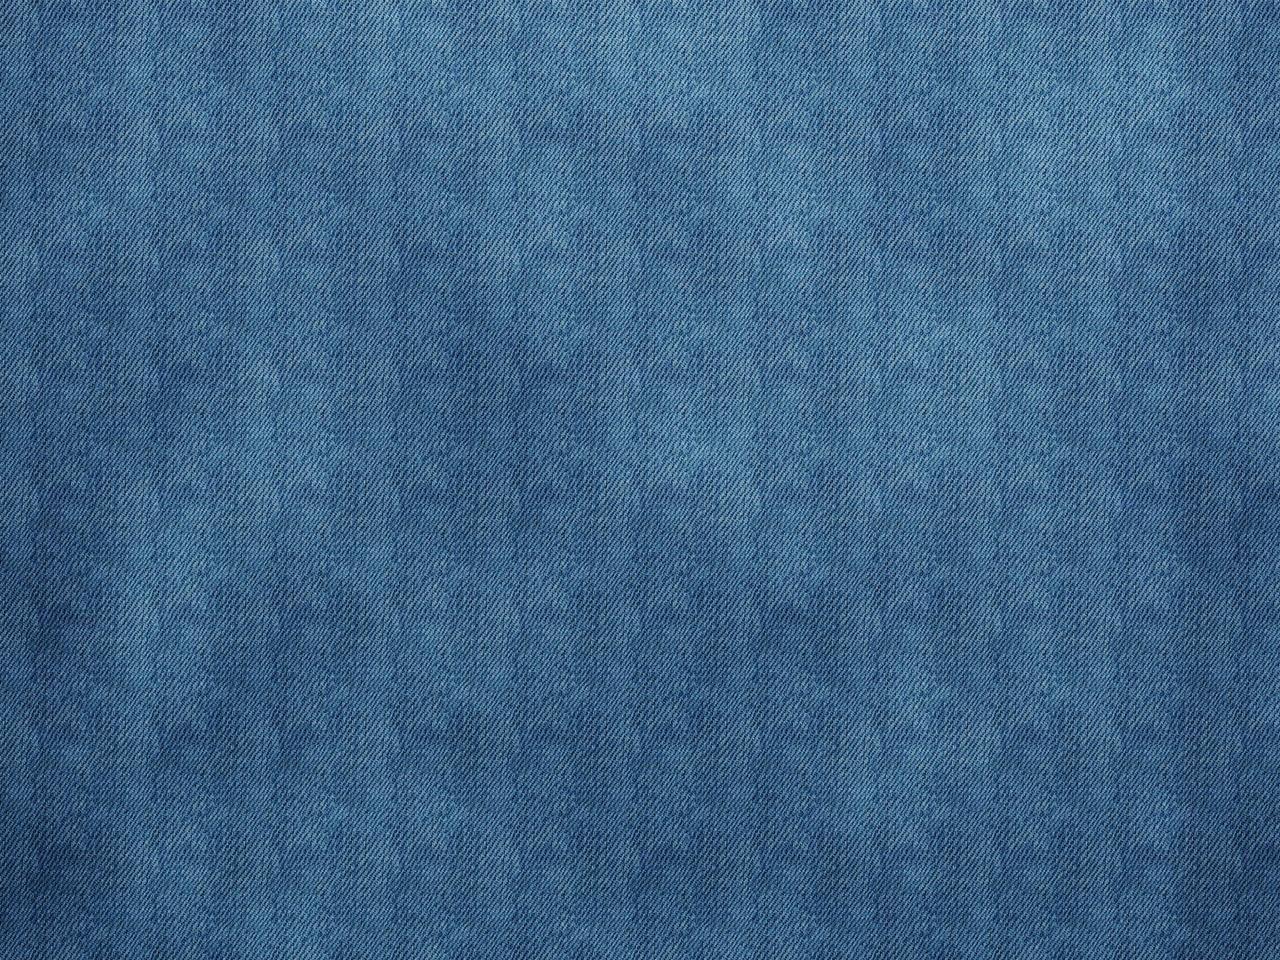 Jeans Denim Free Texture